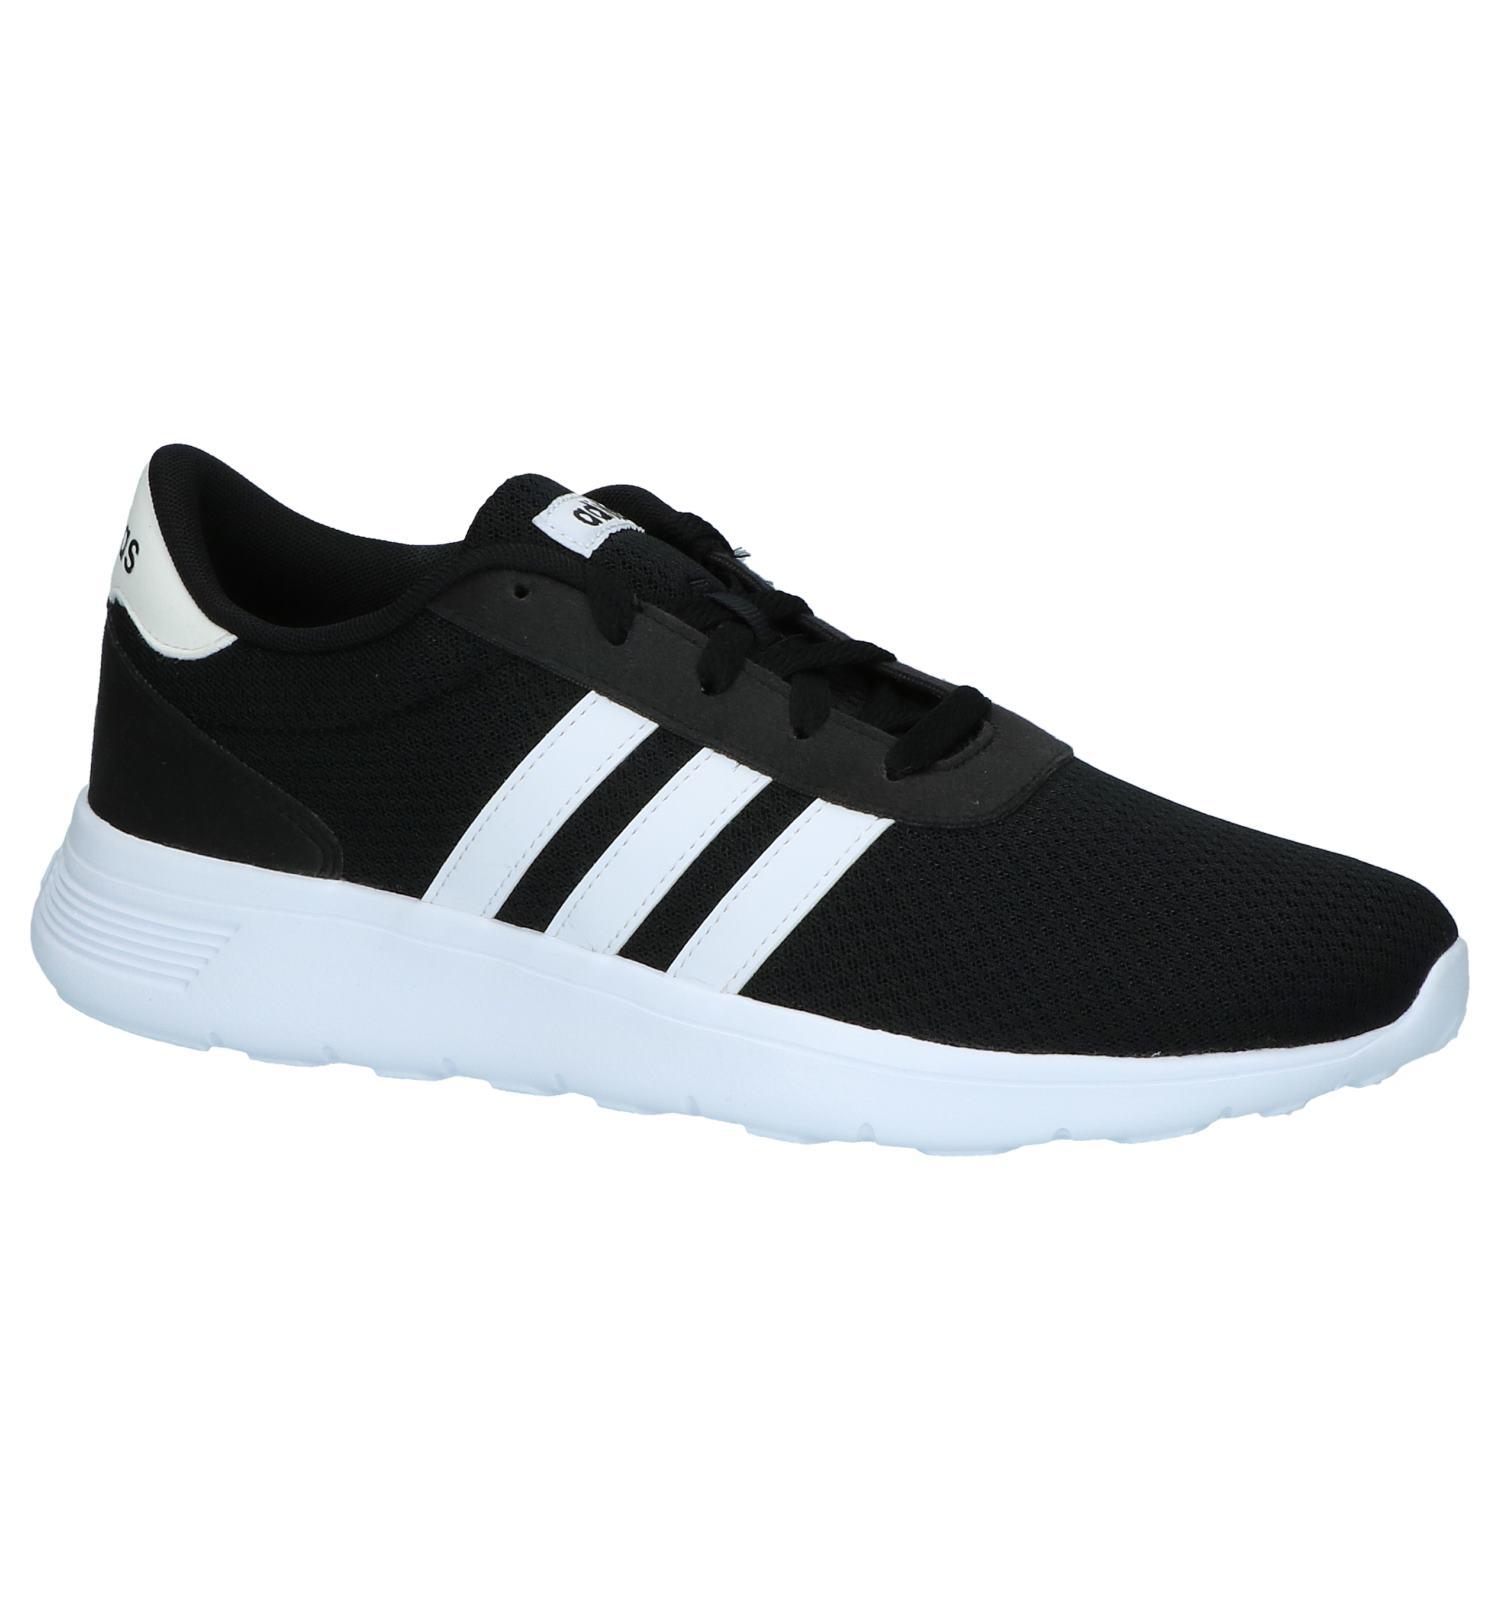 Sneakers Zwart adidas Lite Racer | TORFS.BE | Gratis verzend en retour